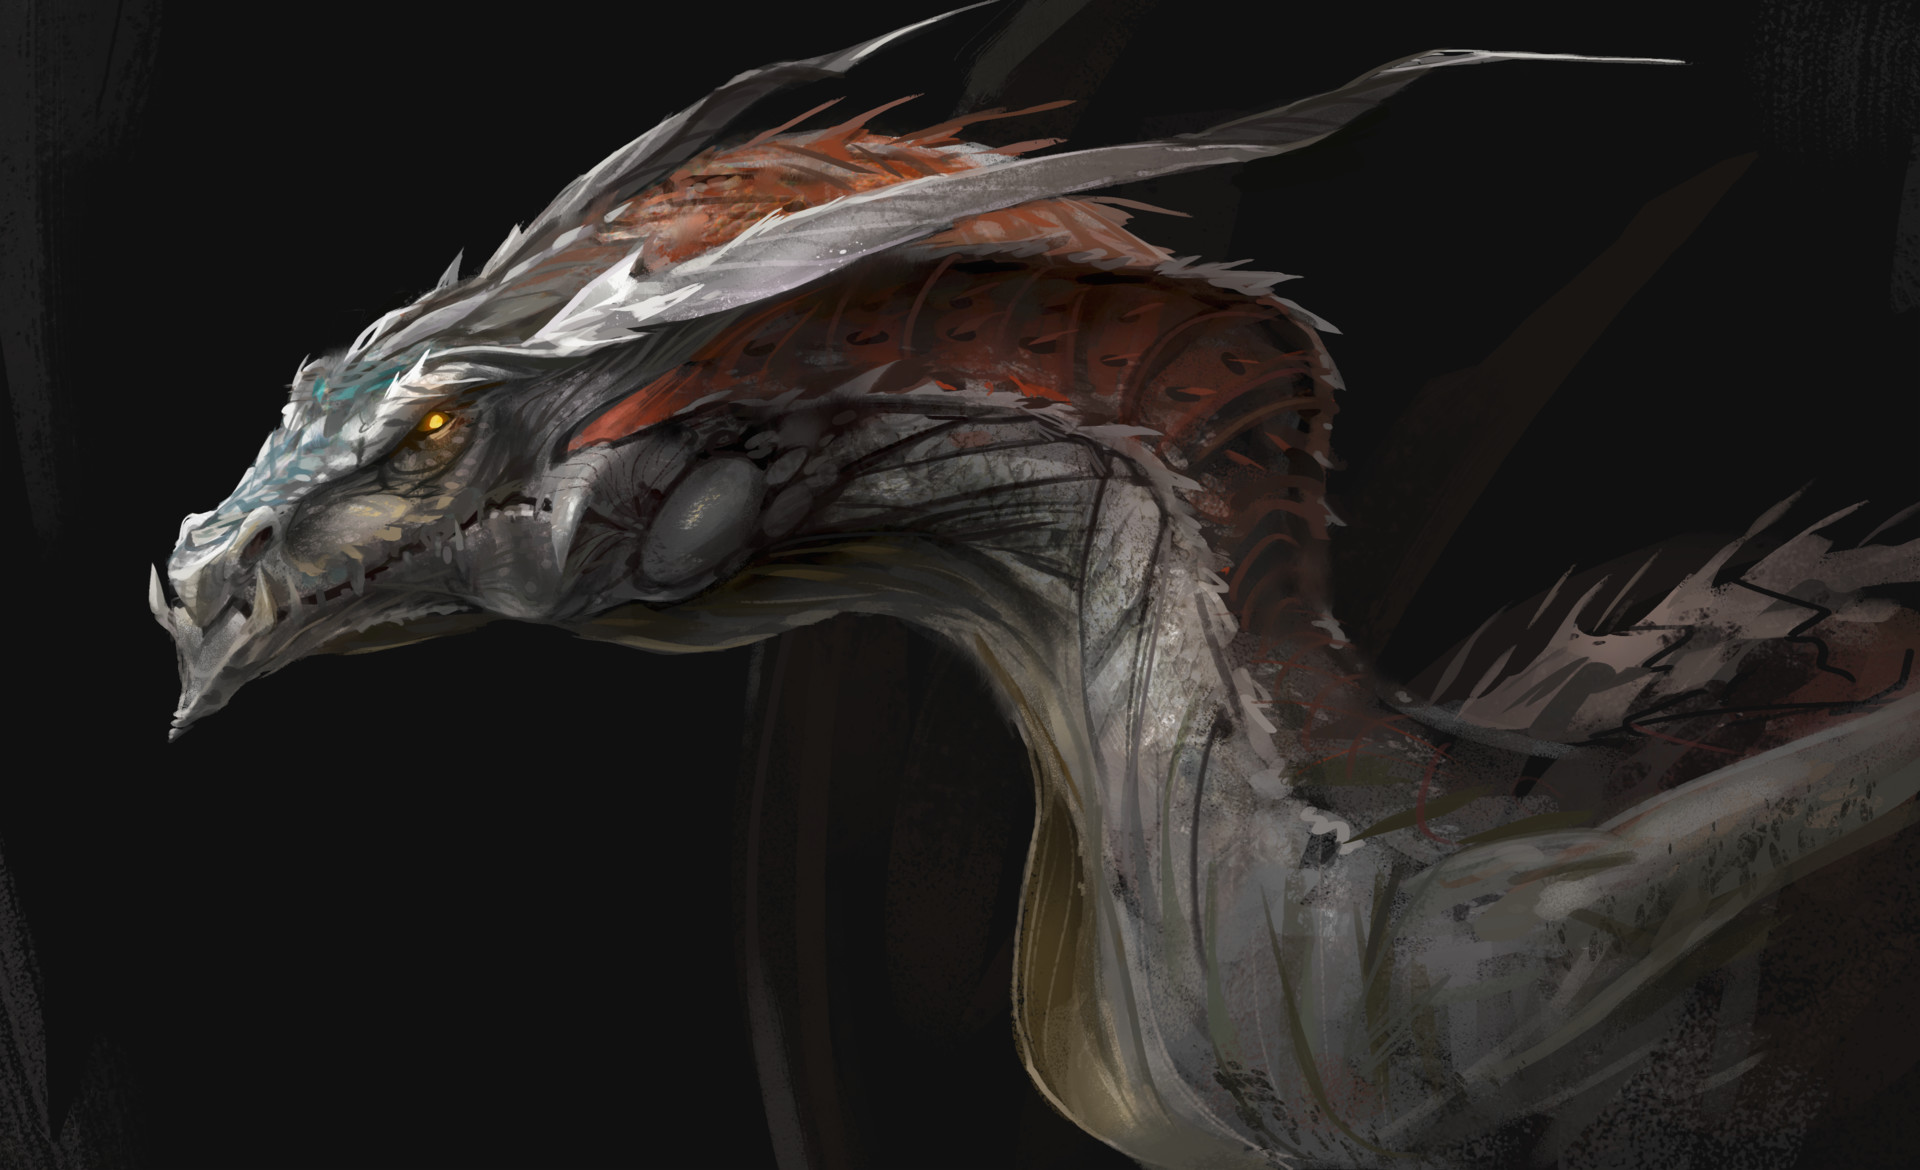 Izaak moody dragon concept 5